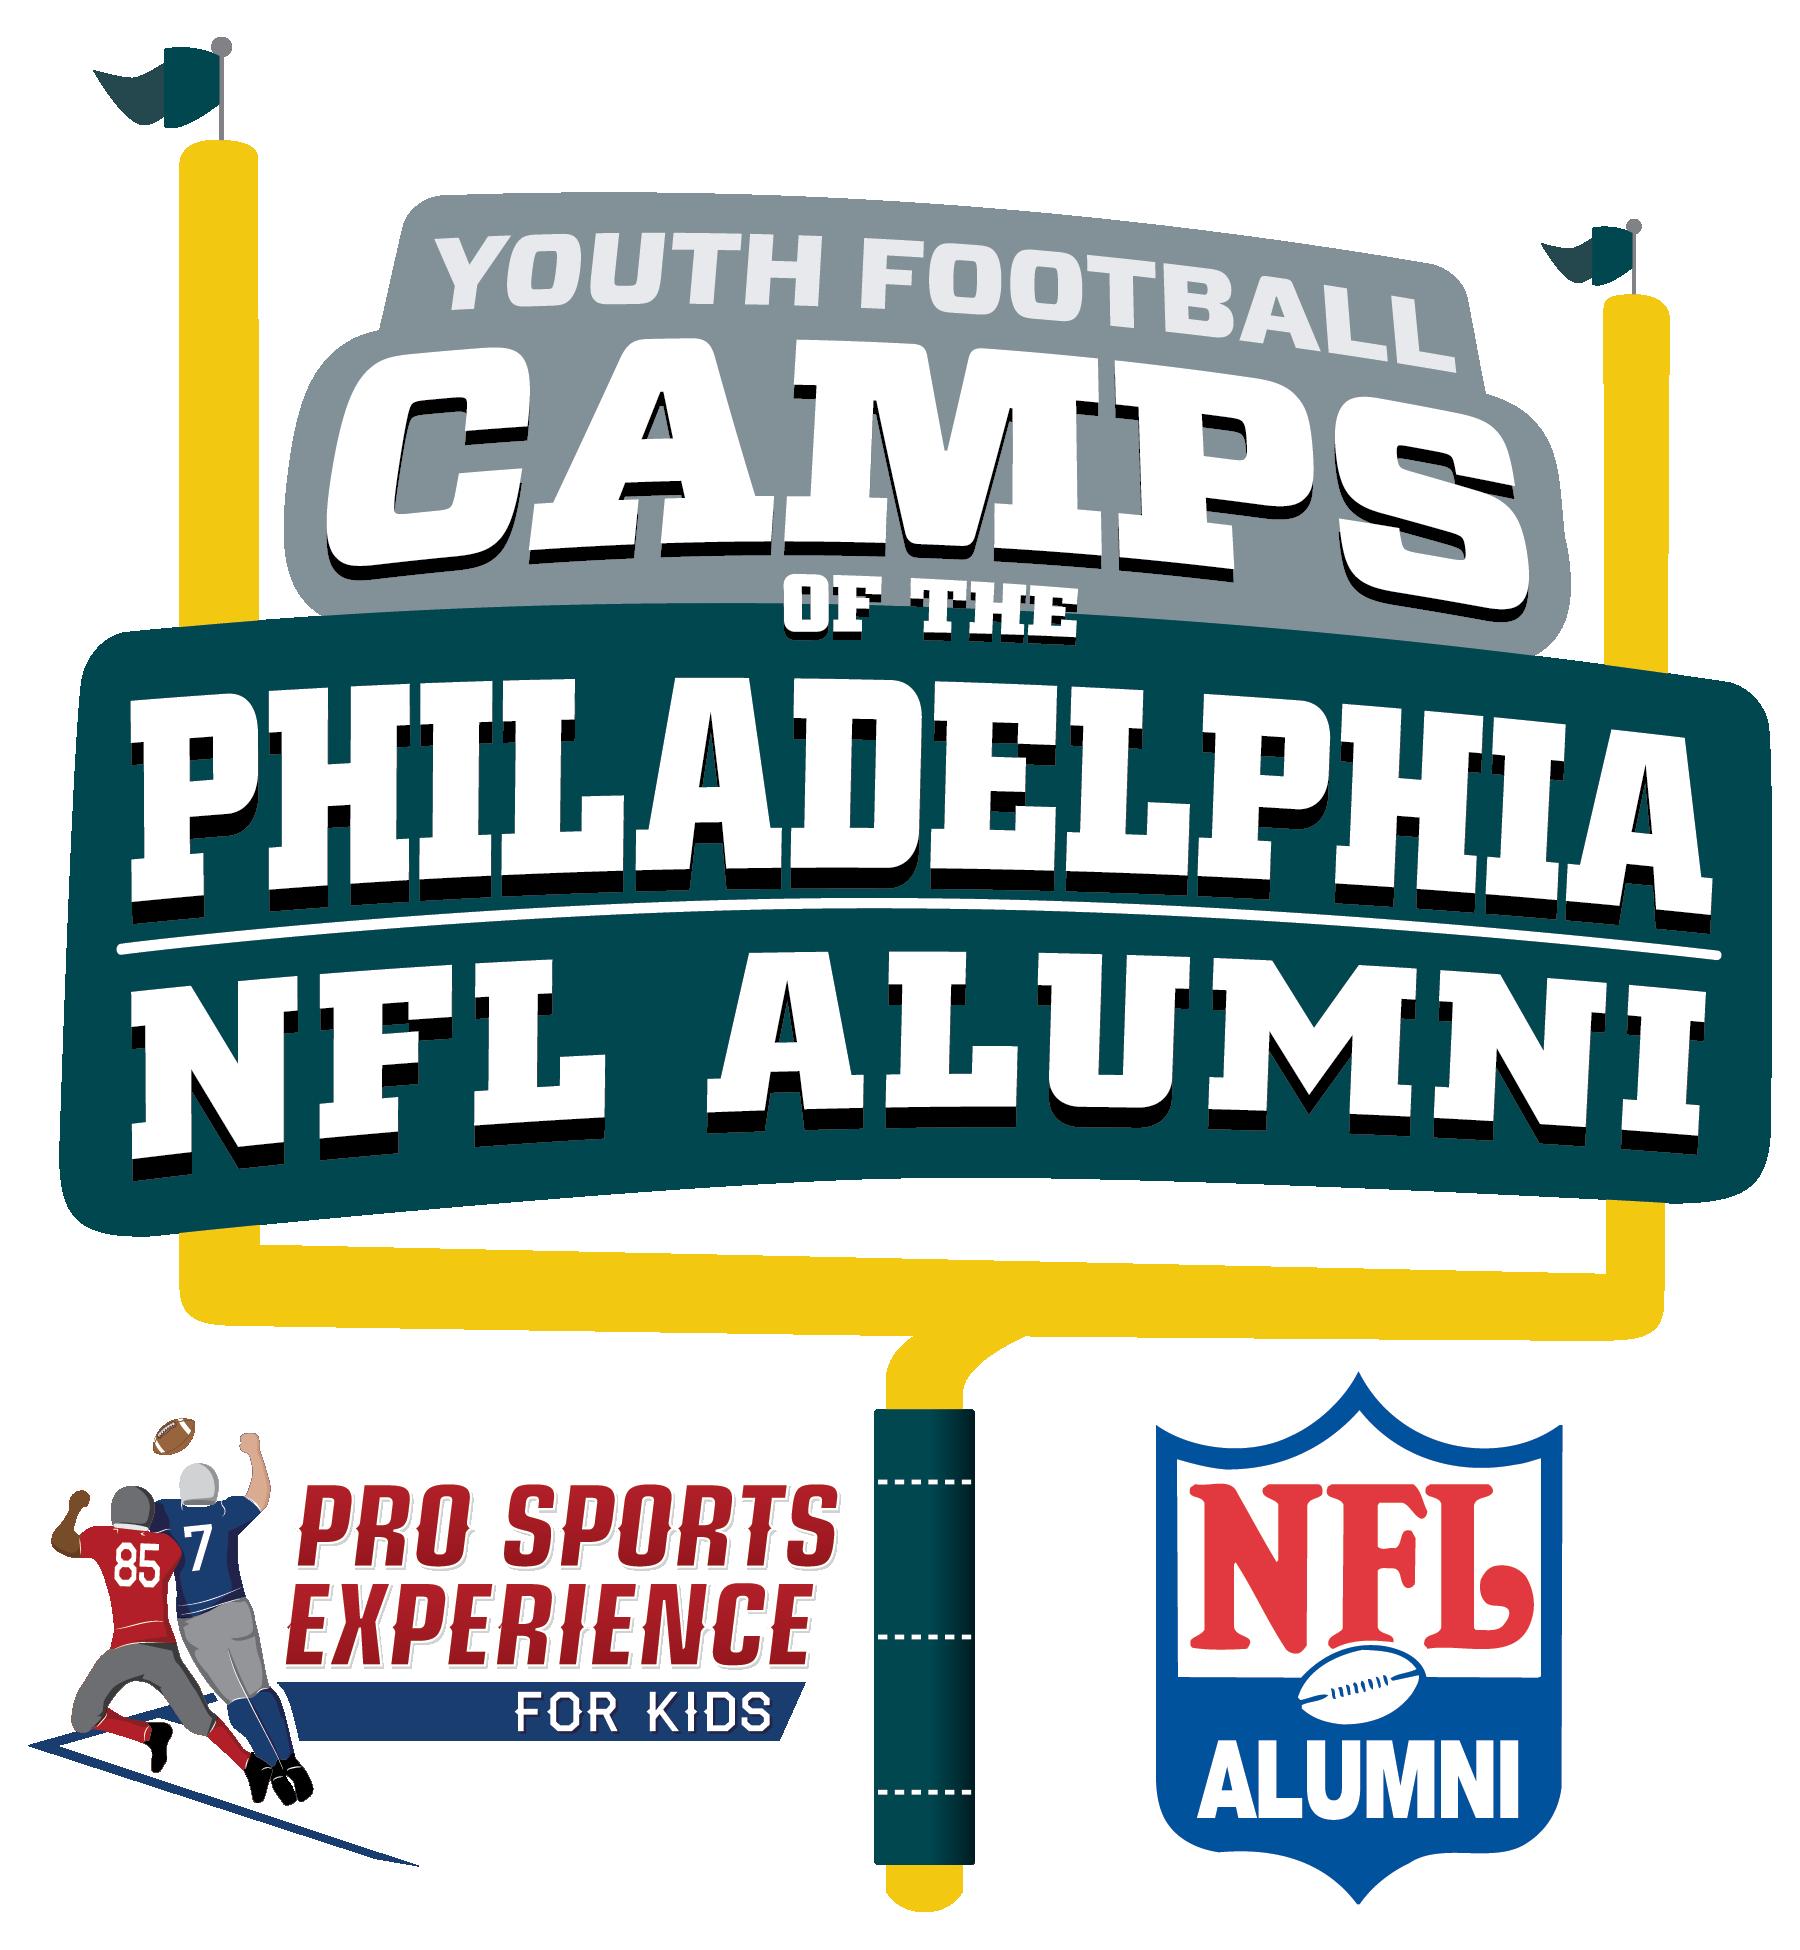 Philadelphia NFL Alumni Hero Youth Football Camps - Malvern